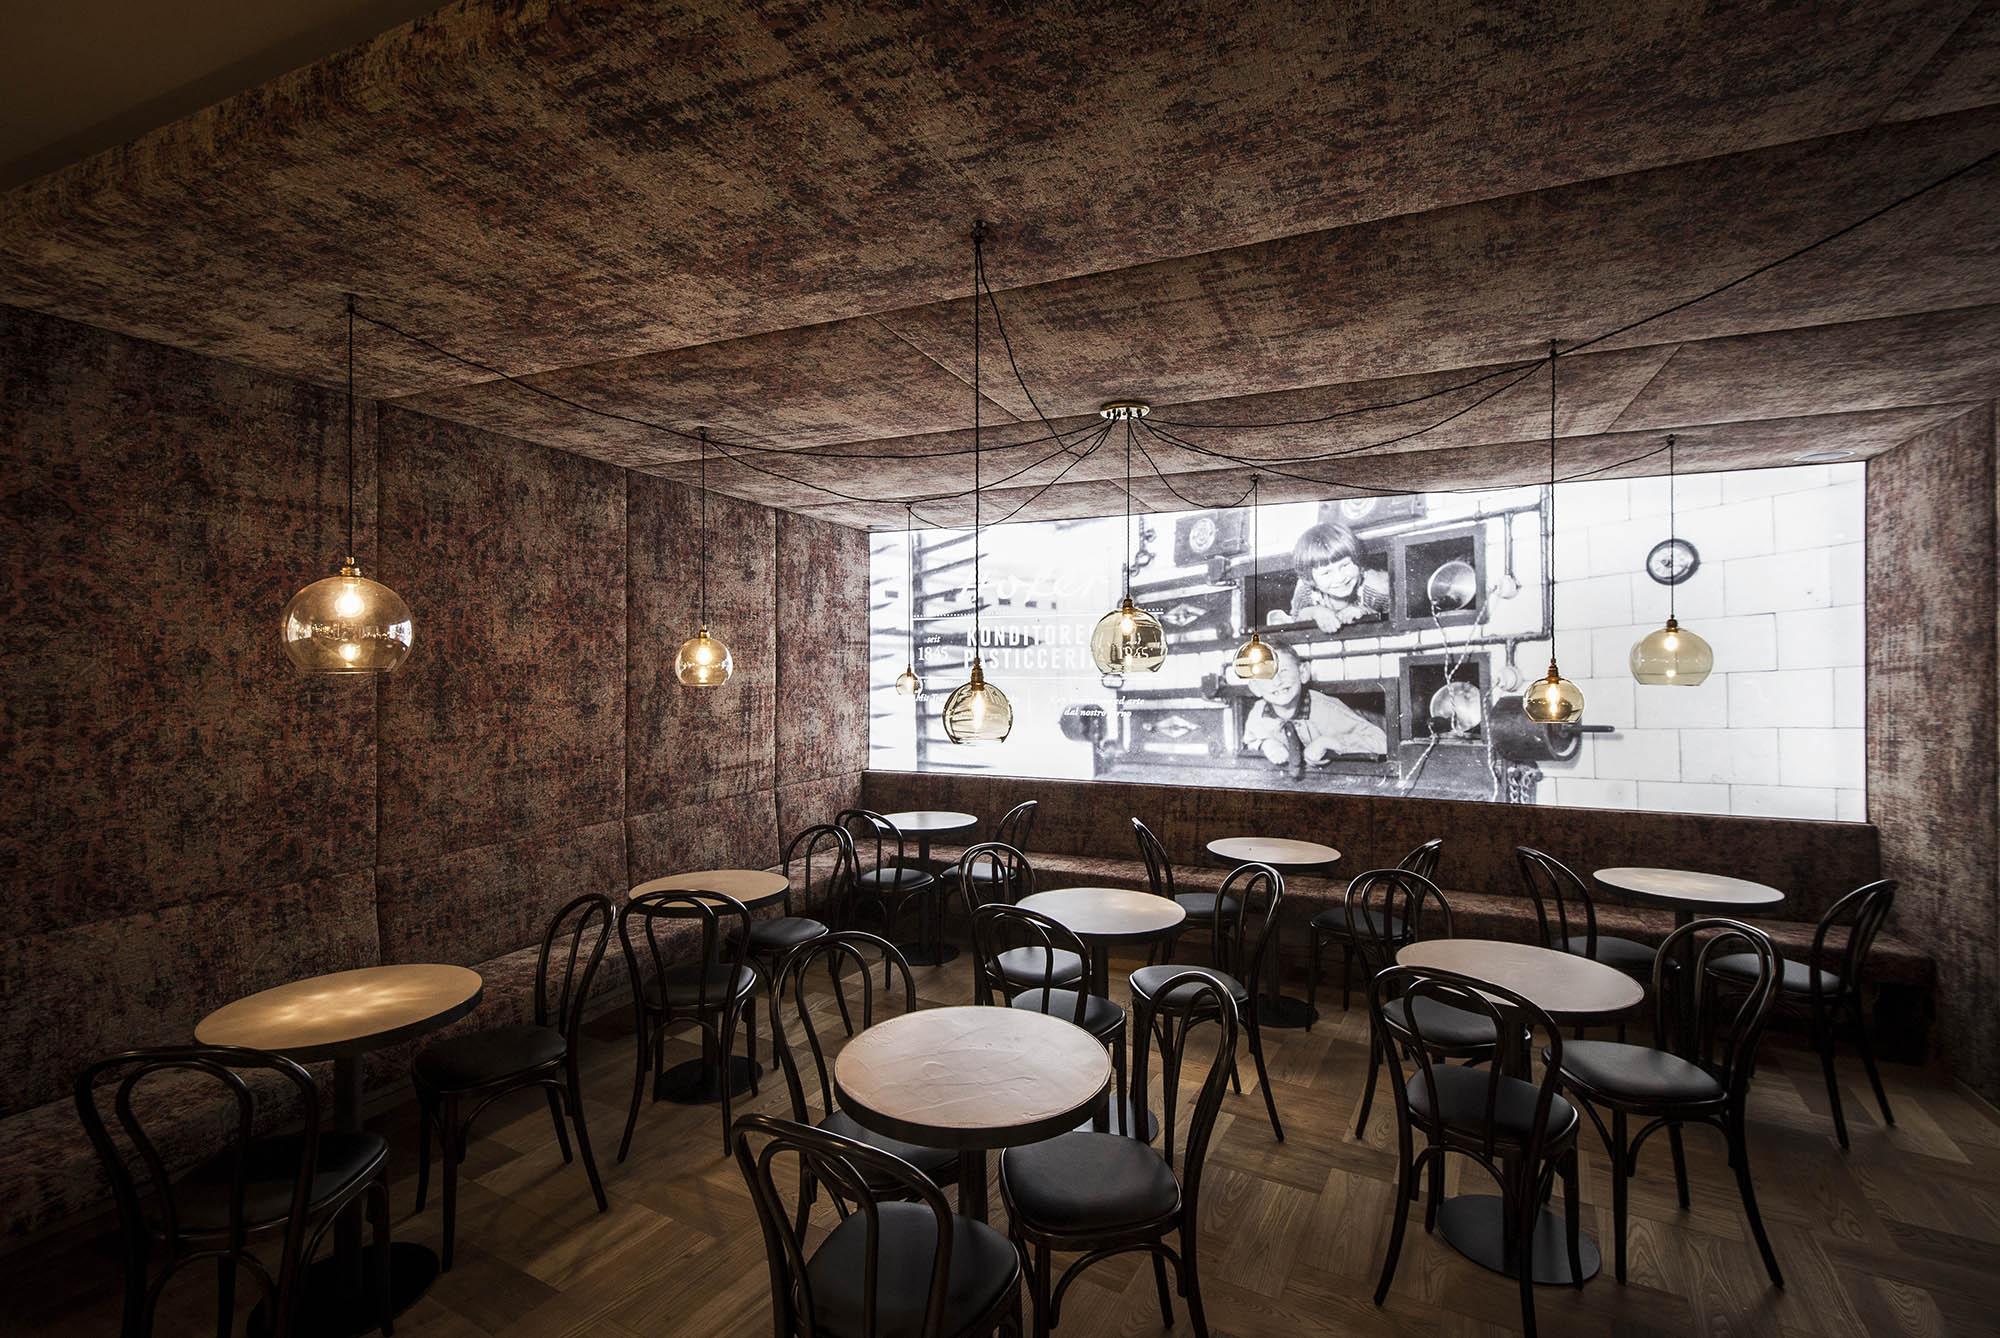 Wiener Kaffeehaus - Lounge